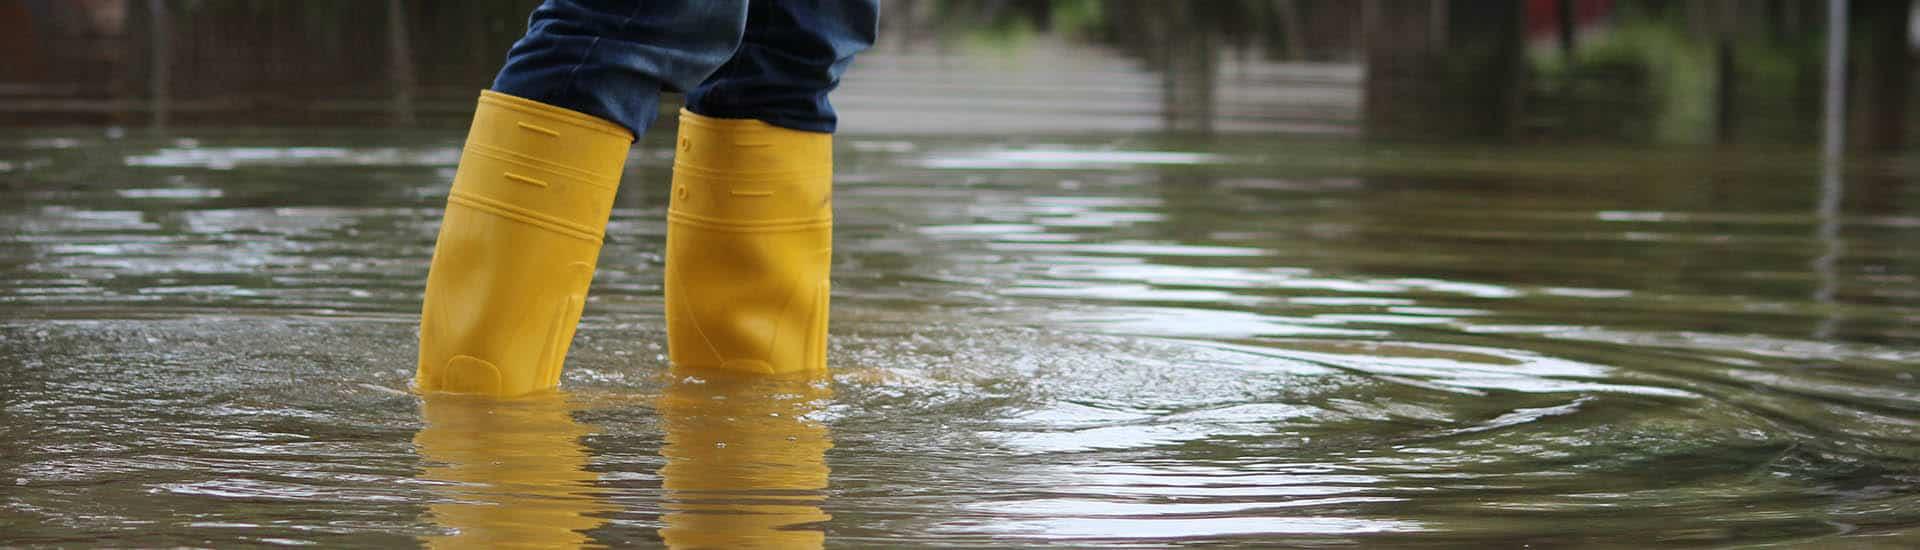 Flood Insurance Quotes Oregon Flood Insurance Free Flood Insurance Quote  Bancorp Insurance